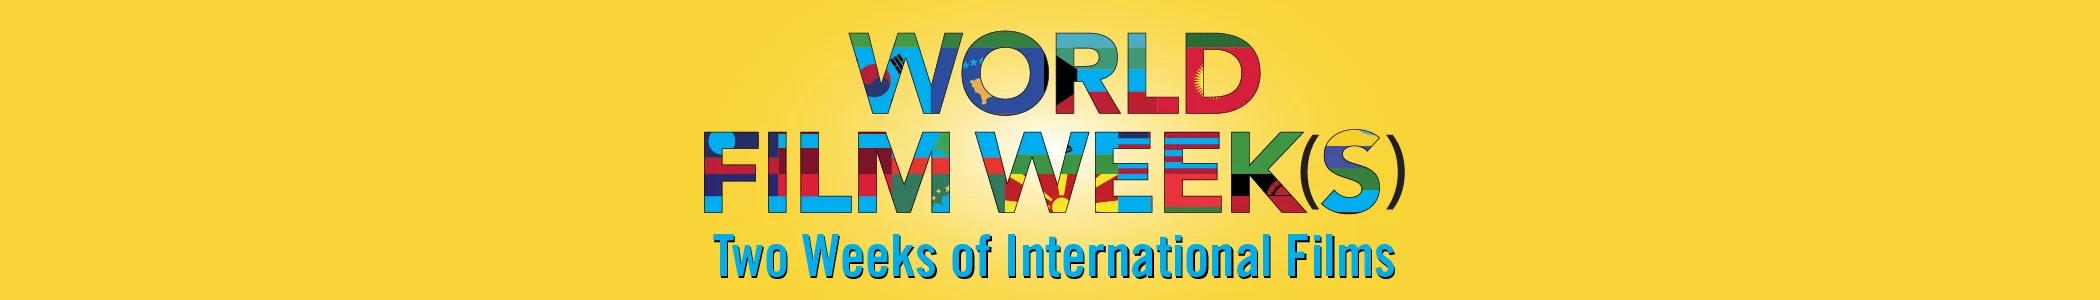 AIFF WORLD FILM WEEK(S) - 9/17-9/30/2021 (Virtual & Live)